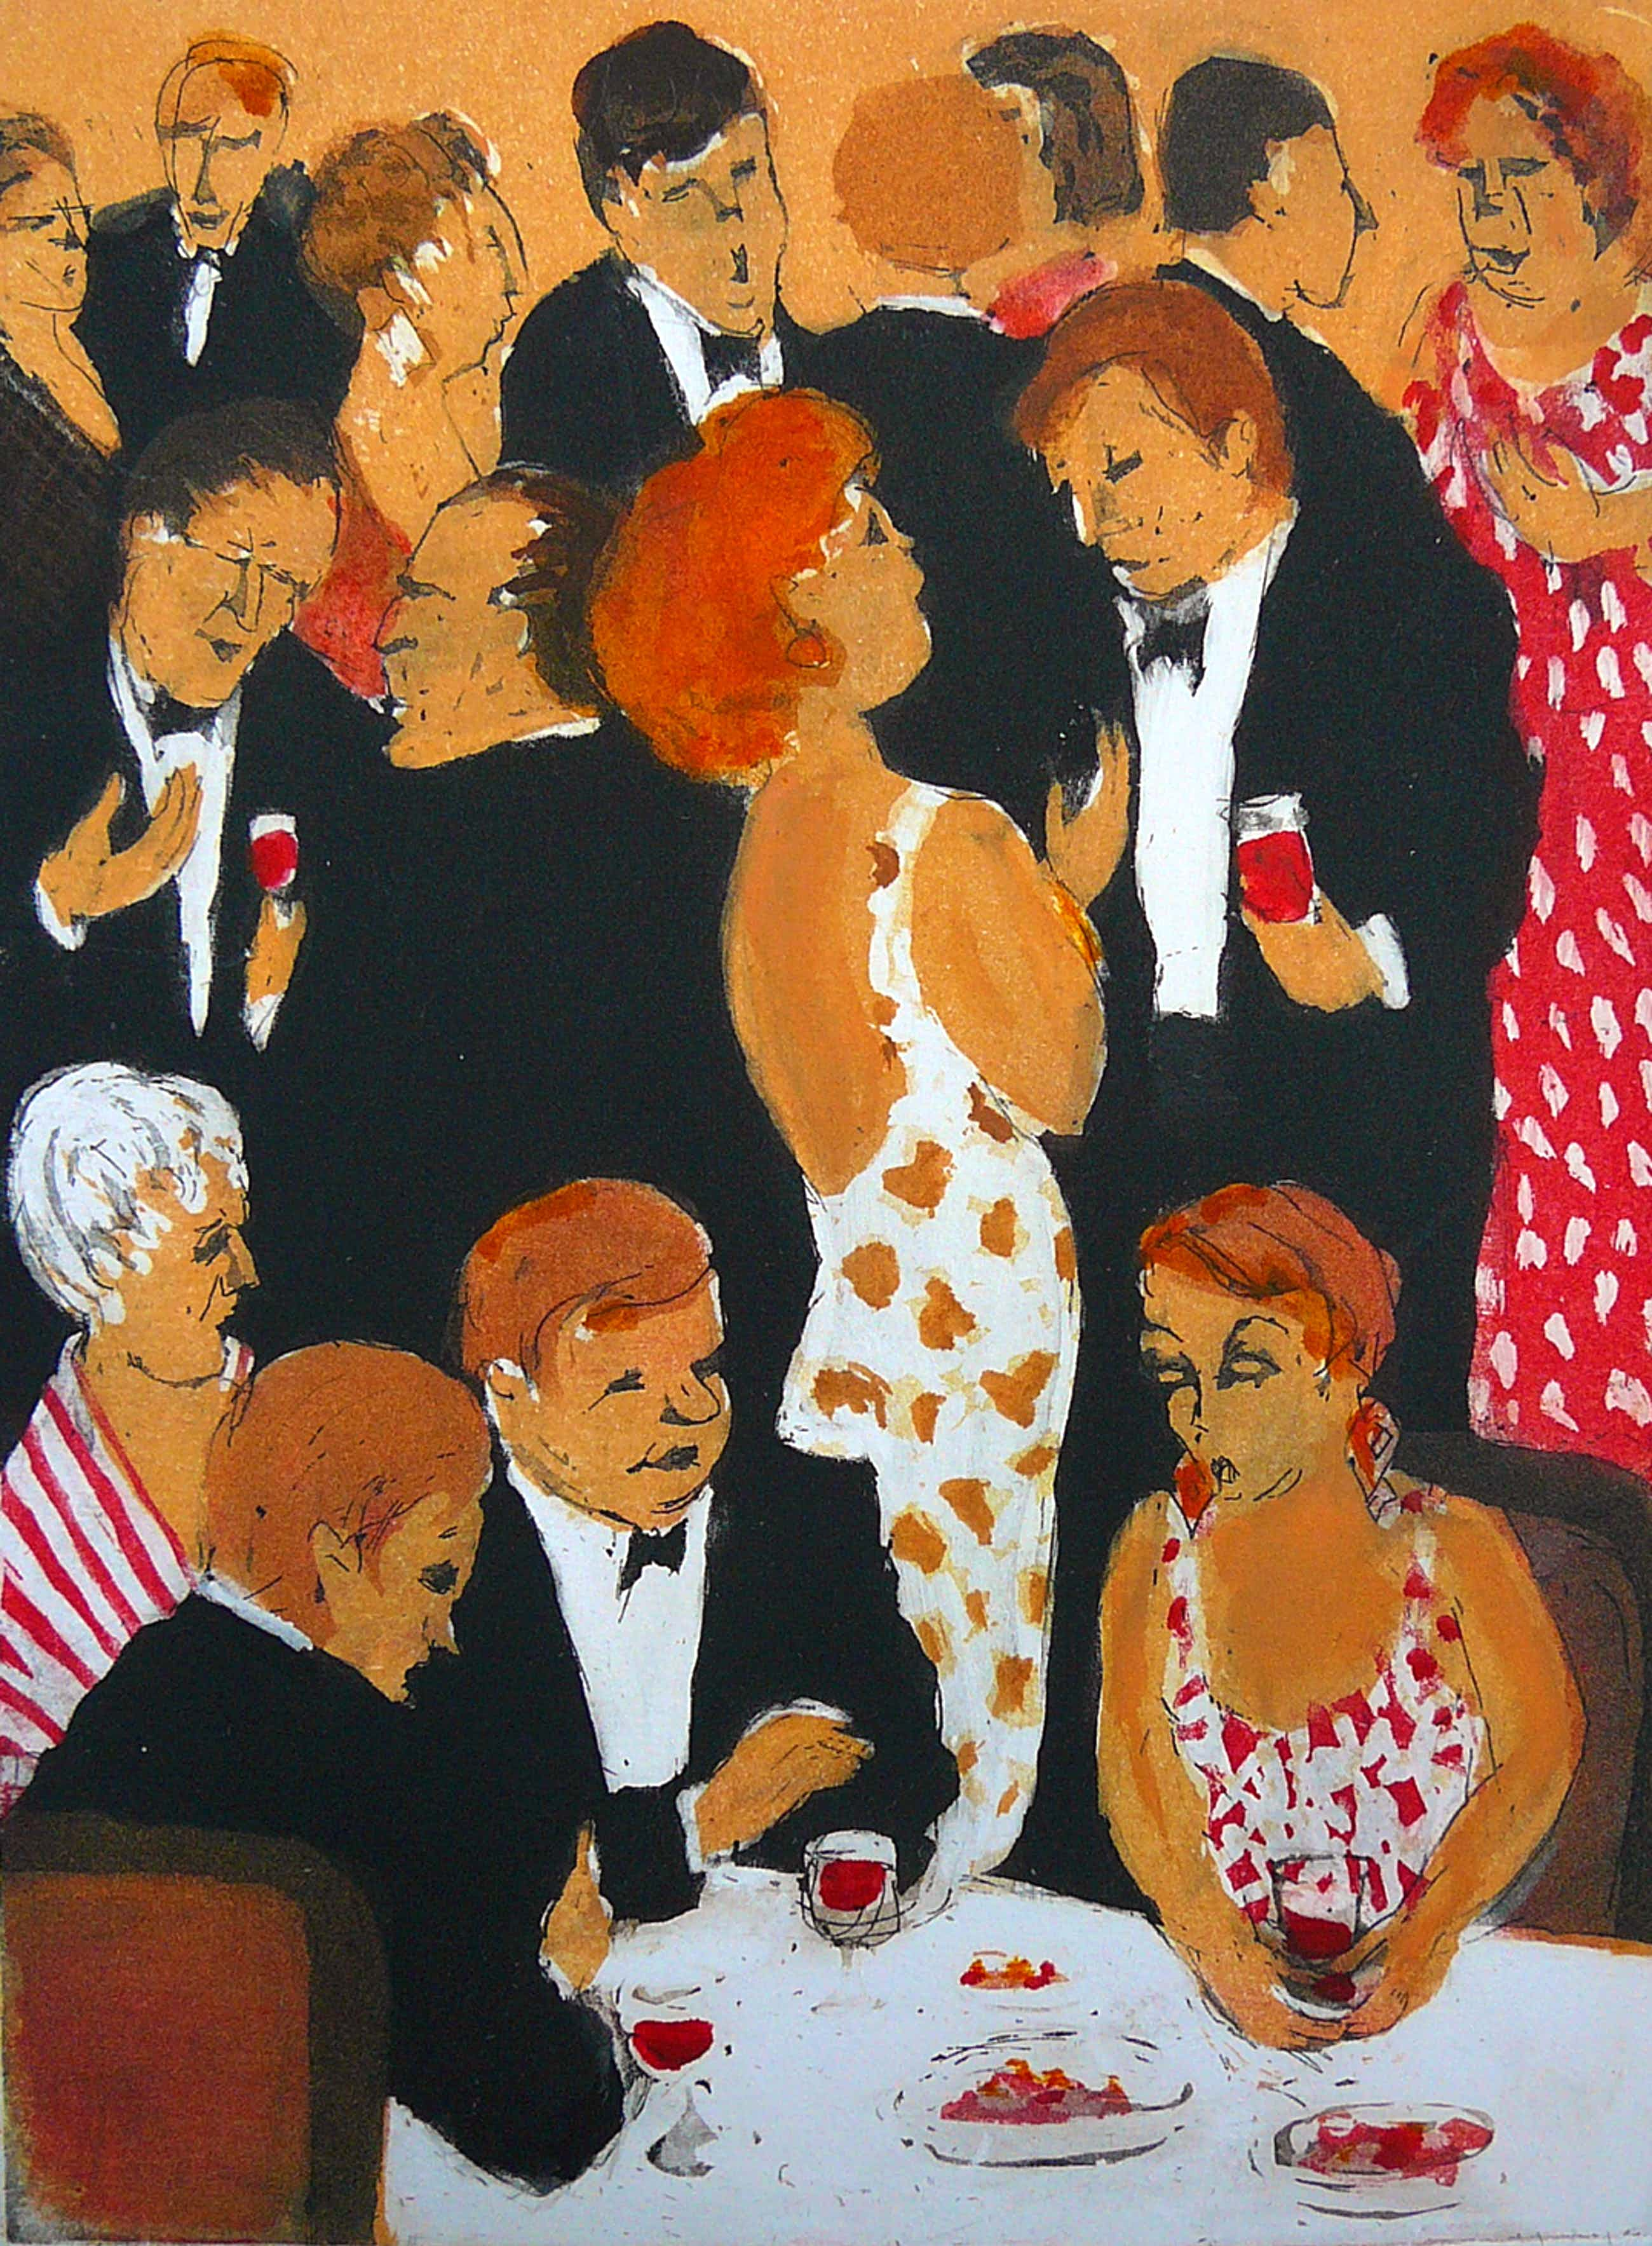 Willy Belinfante - 'December' -gekleurde ets- kopen? Bied vanaf 65!